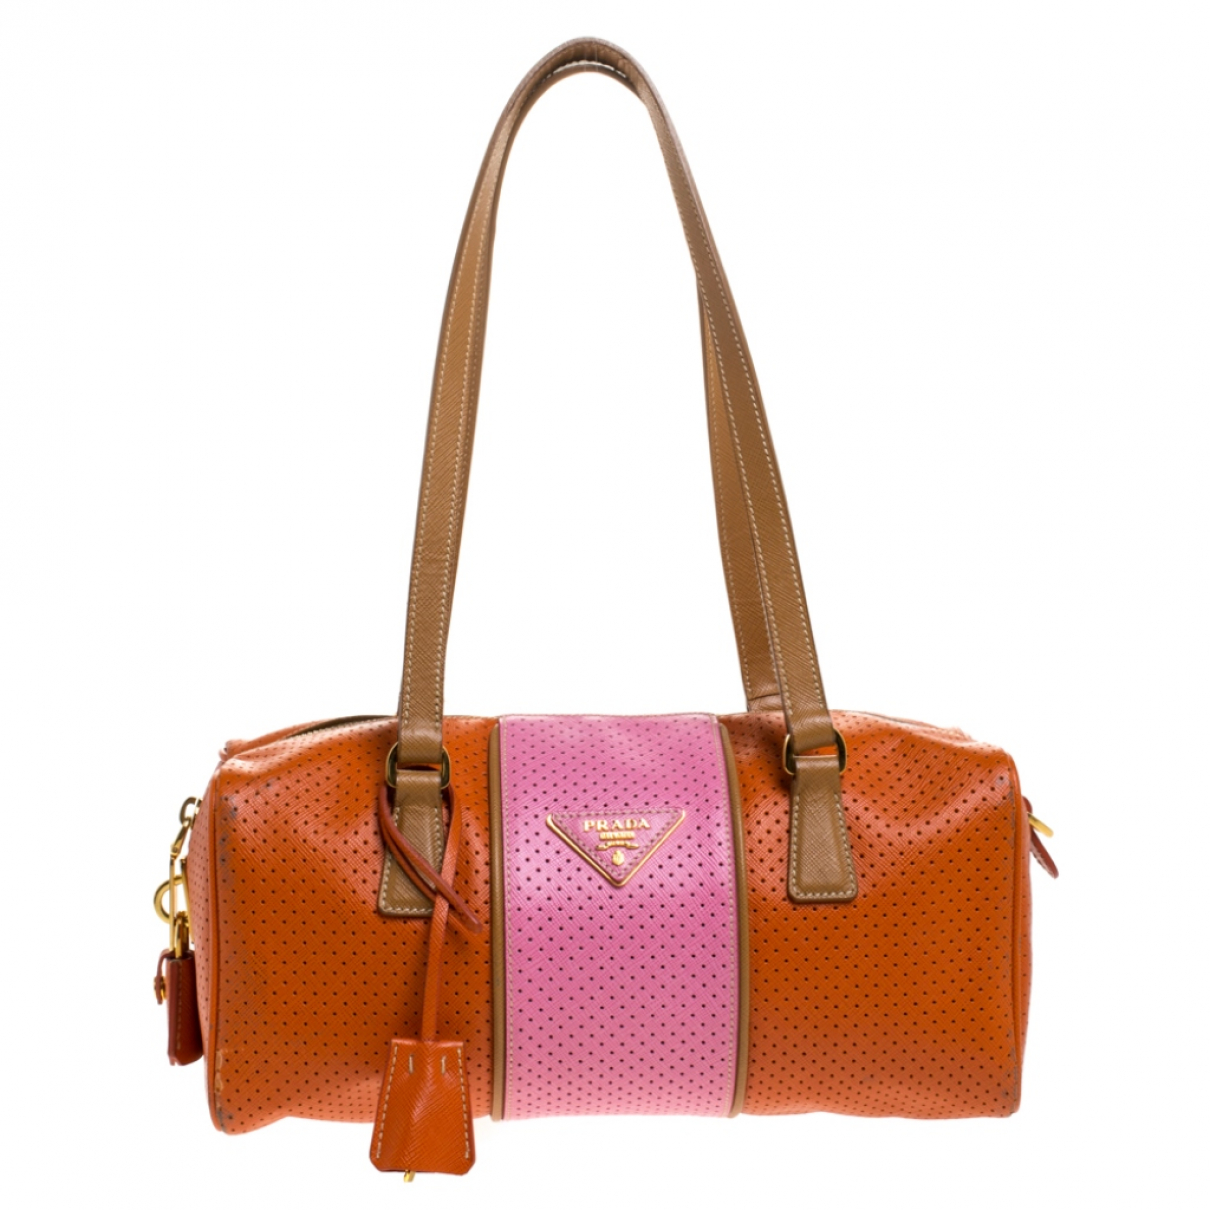 Prada N Orange Leather handbag for Women N